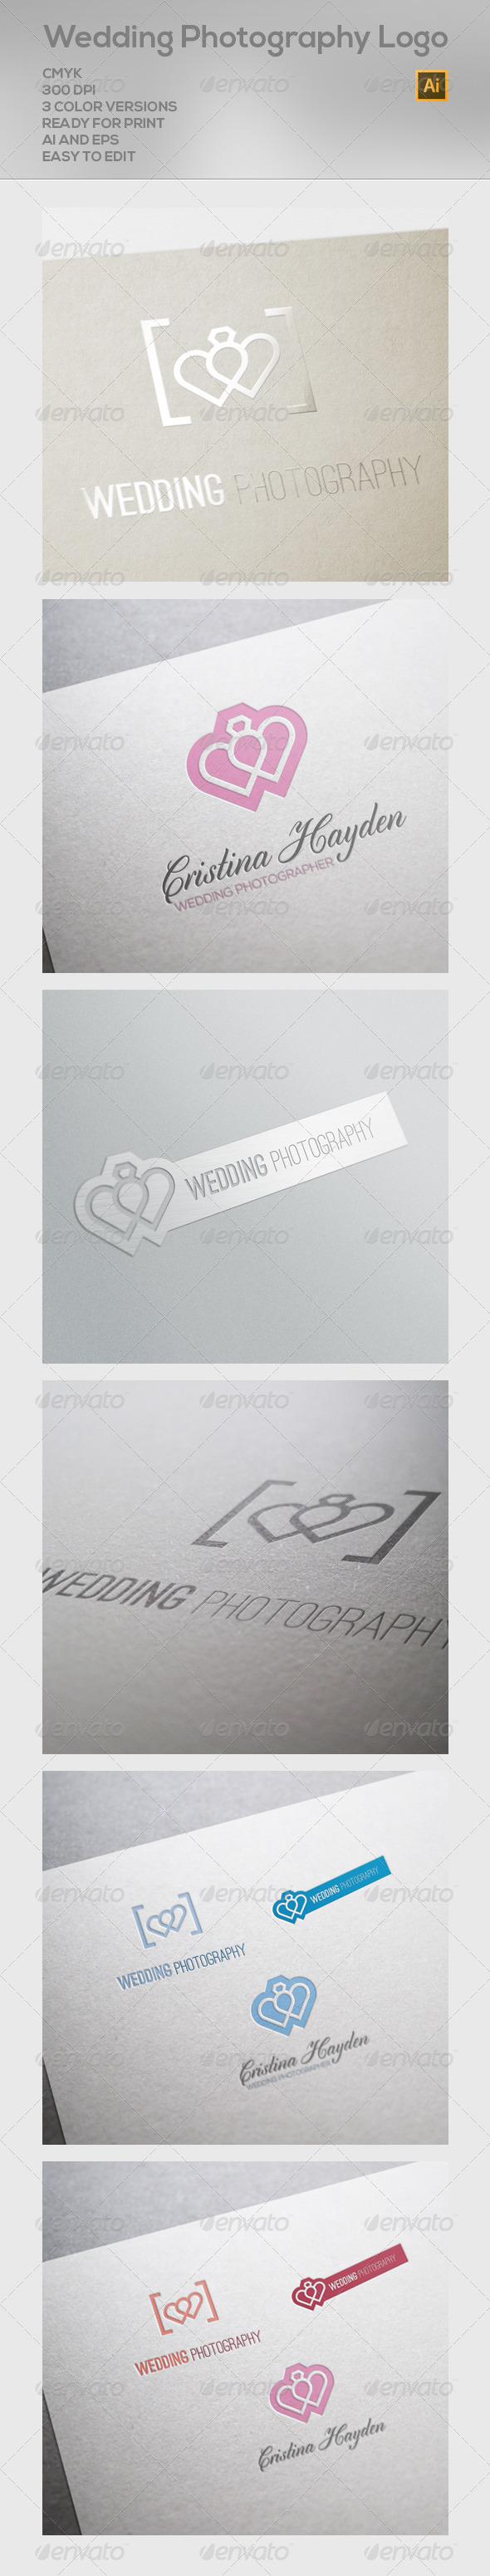 GraphicRiver Wedding Photography Logo 6592751